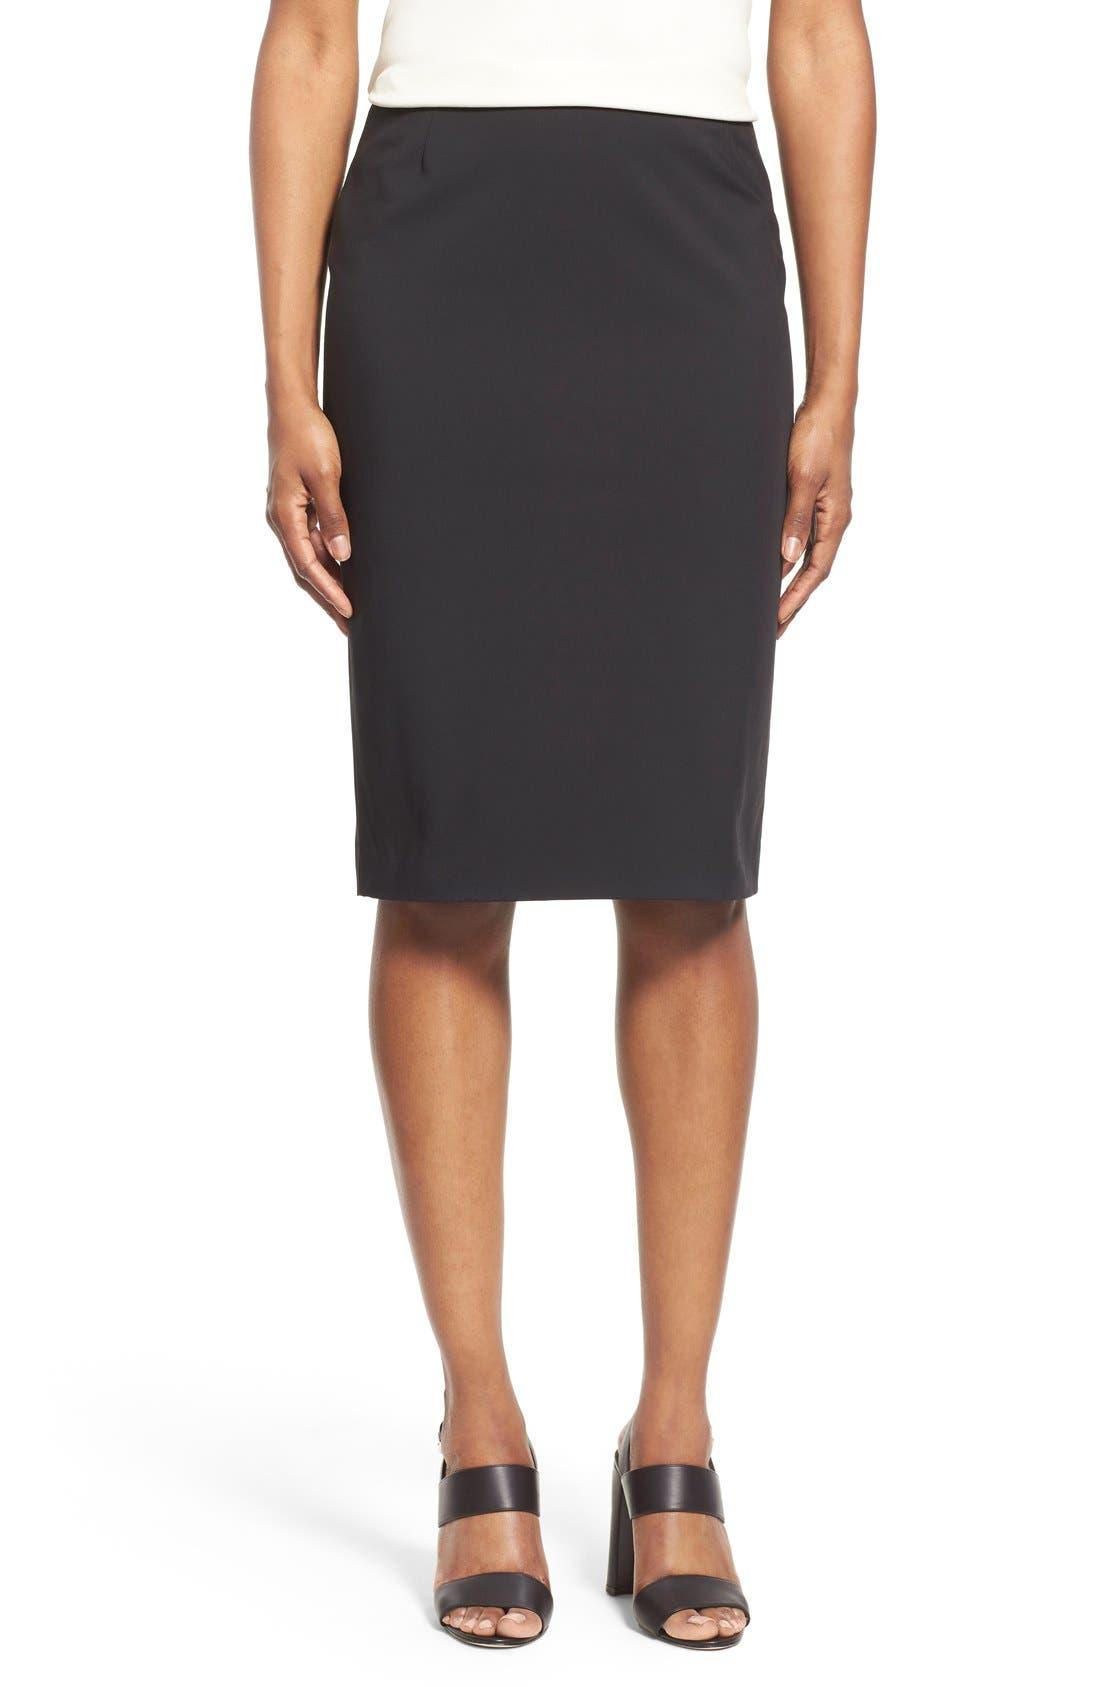 Alternate Image 1 Selected - Lafayette 148 New York Pencil Skirt